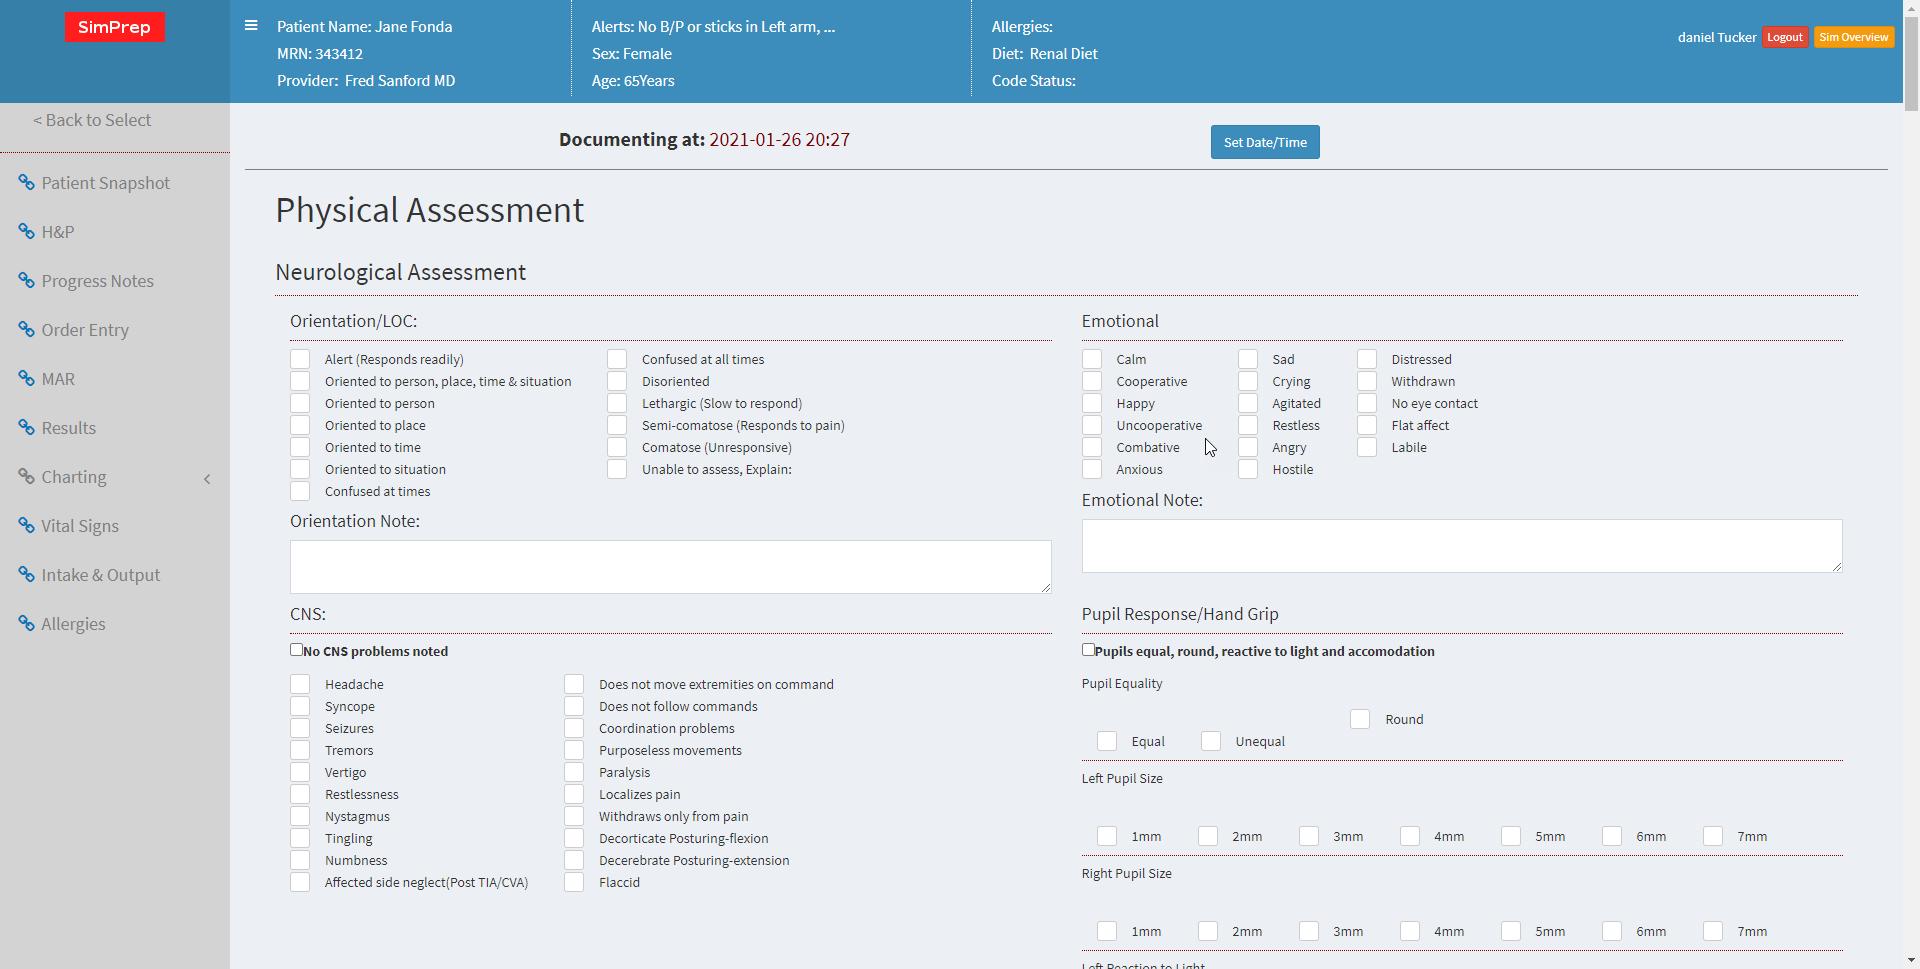 SimPrep nursing simulation software